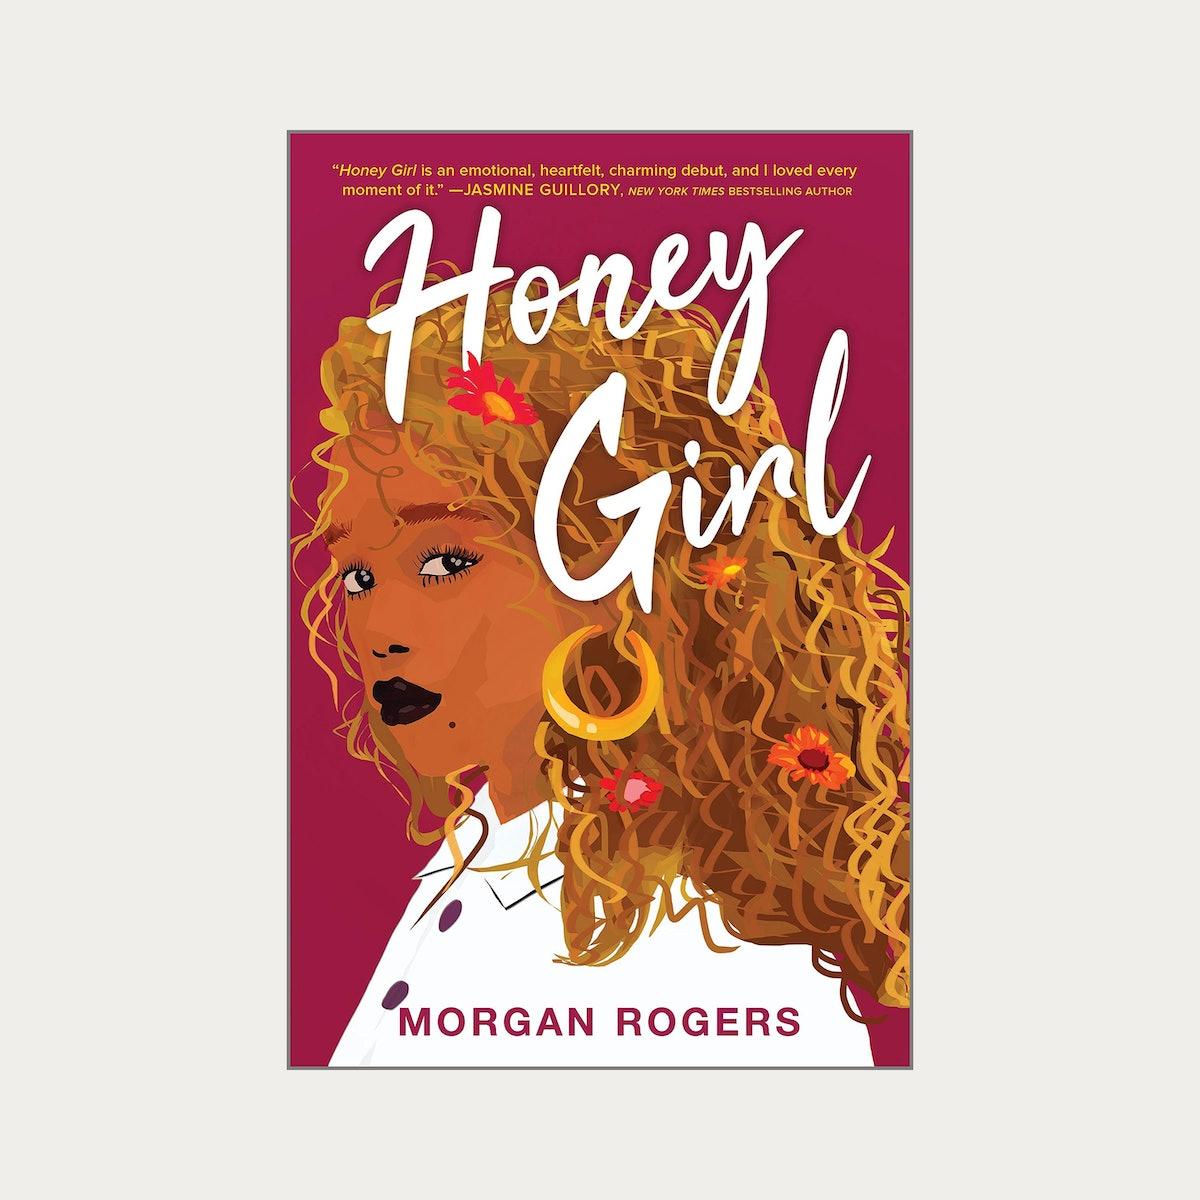 'Honey Girl' by Morgan Rogers